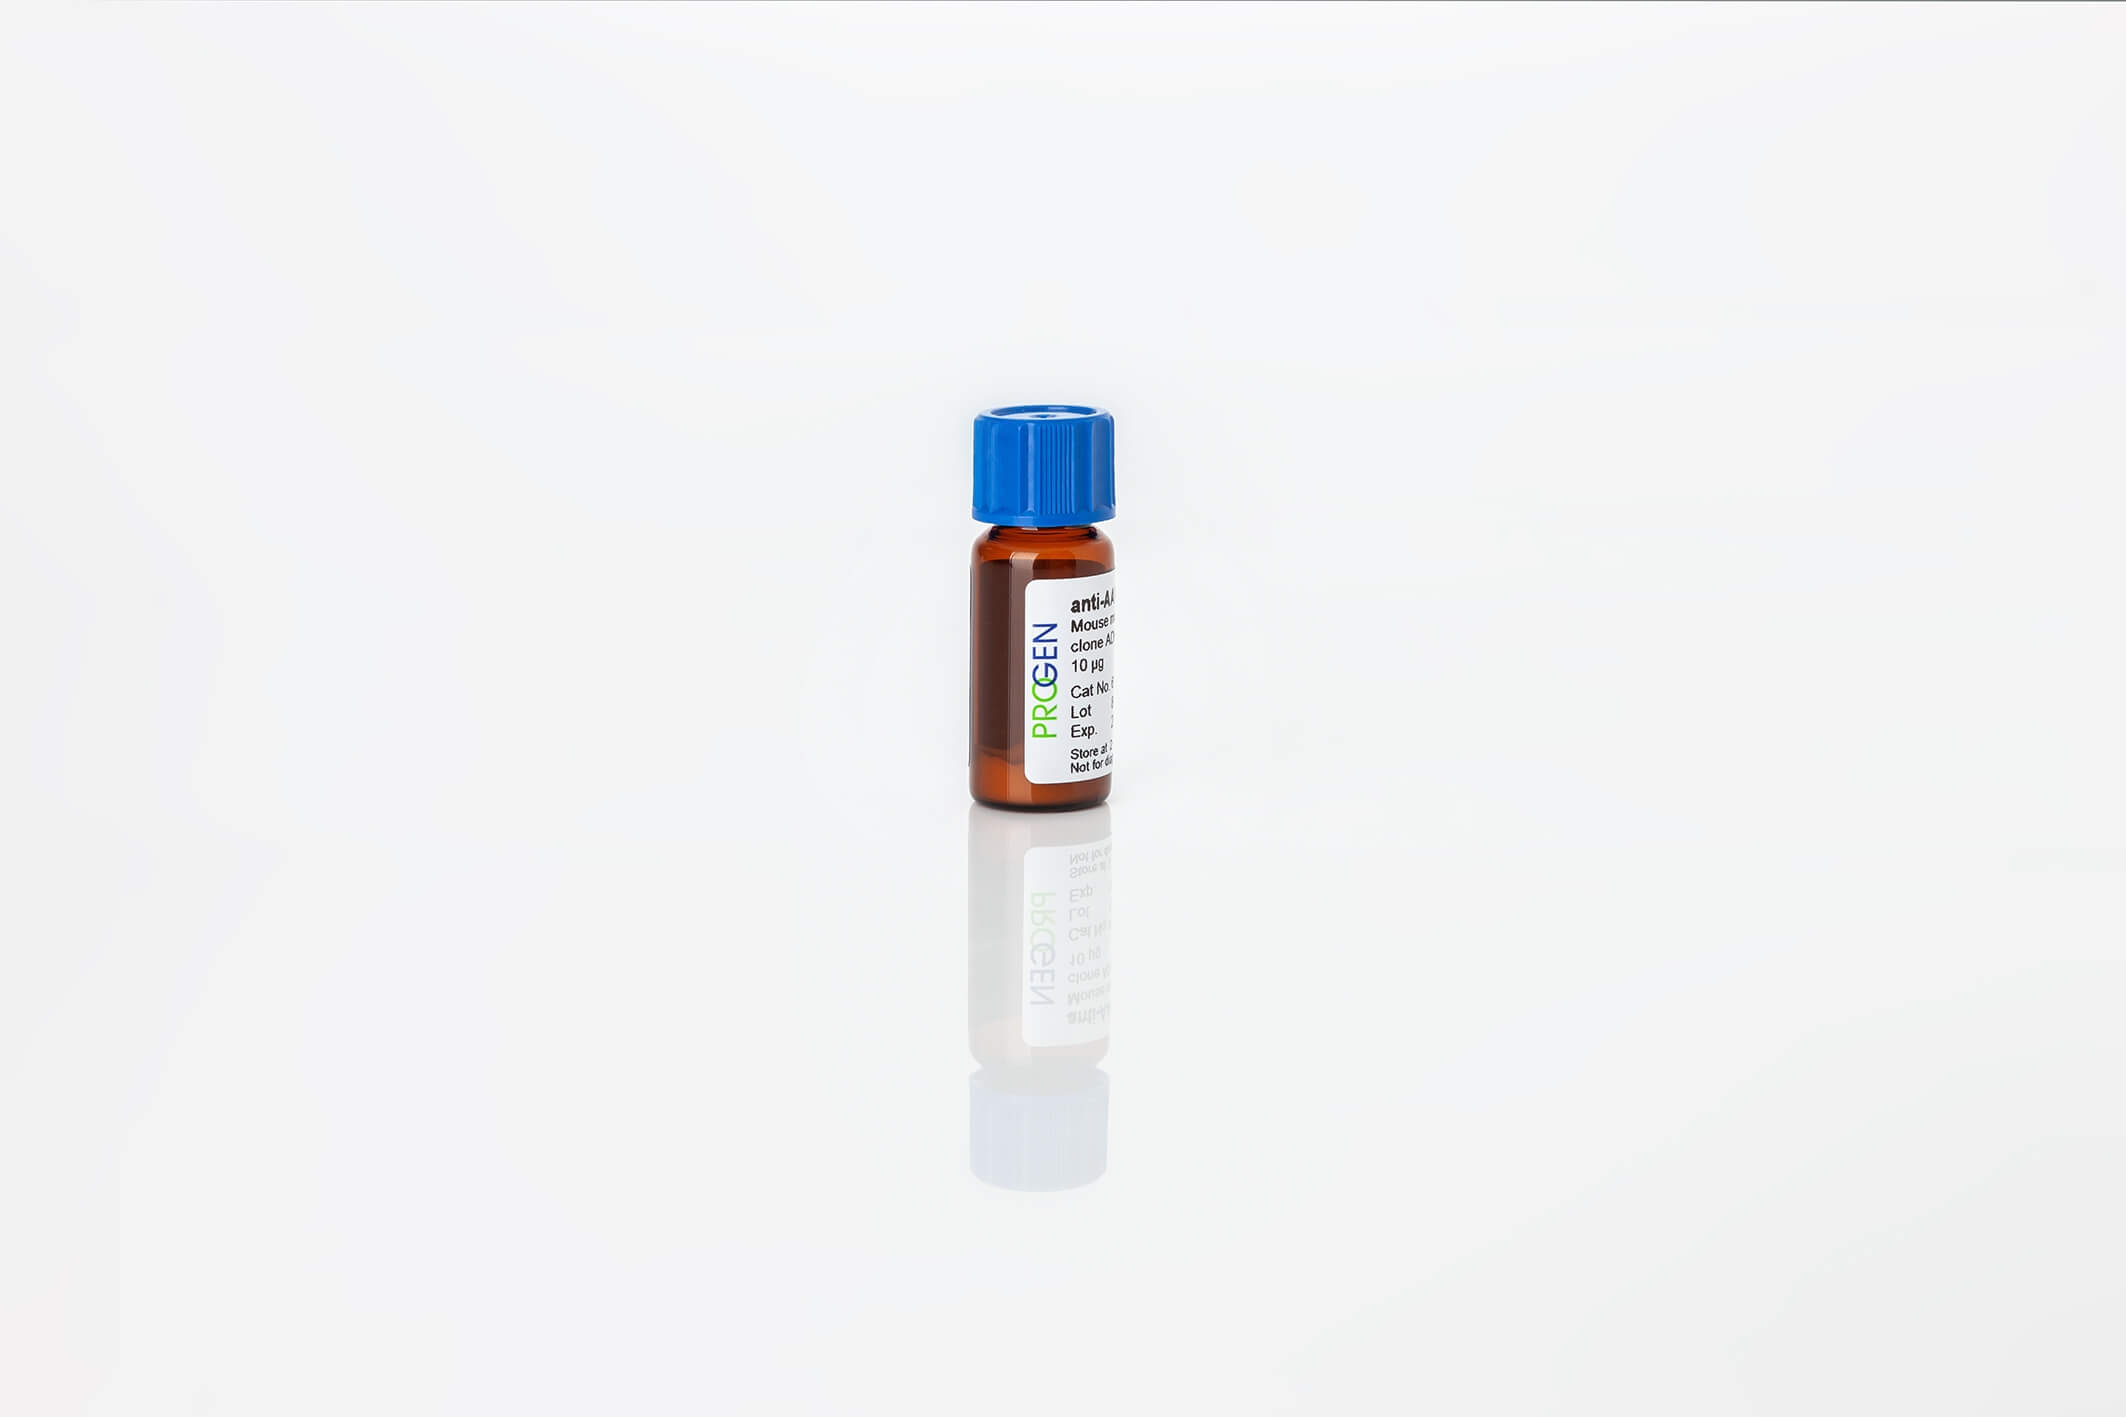 anti-ARVCF guinea pig polyclonal, serum